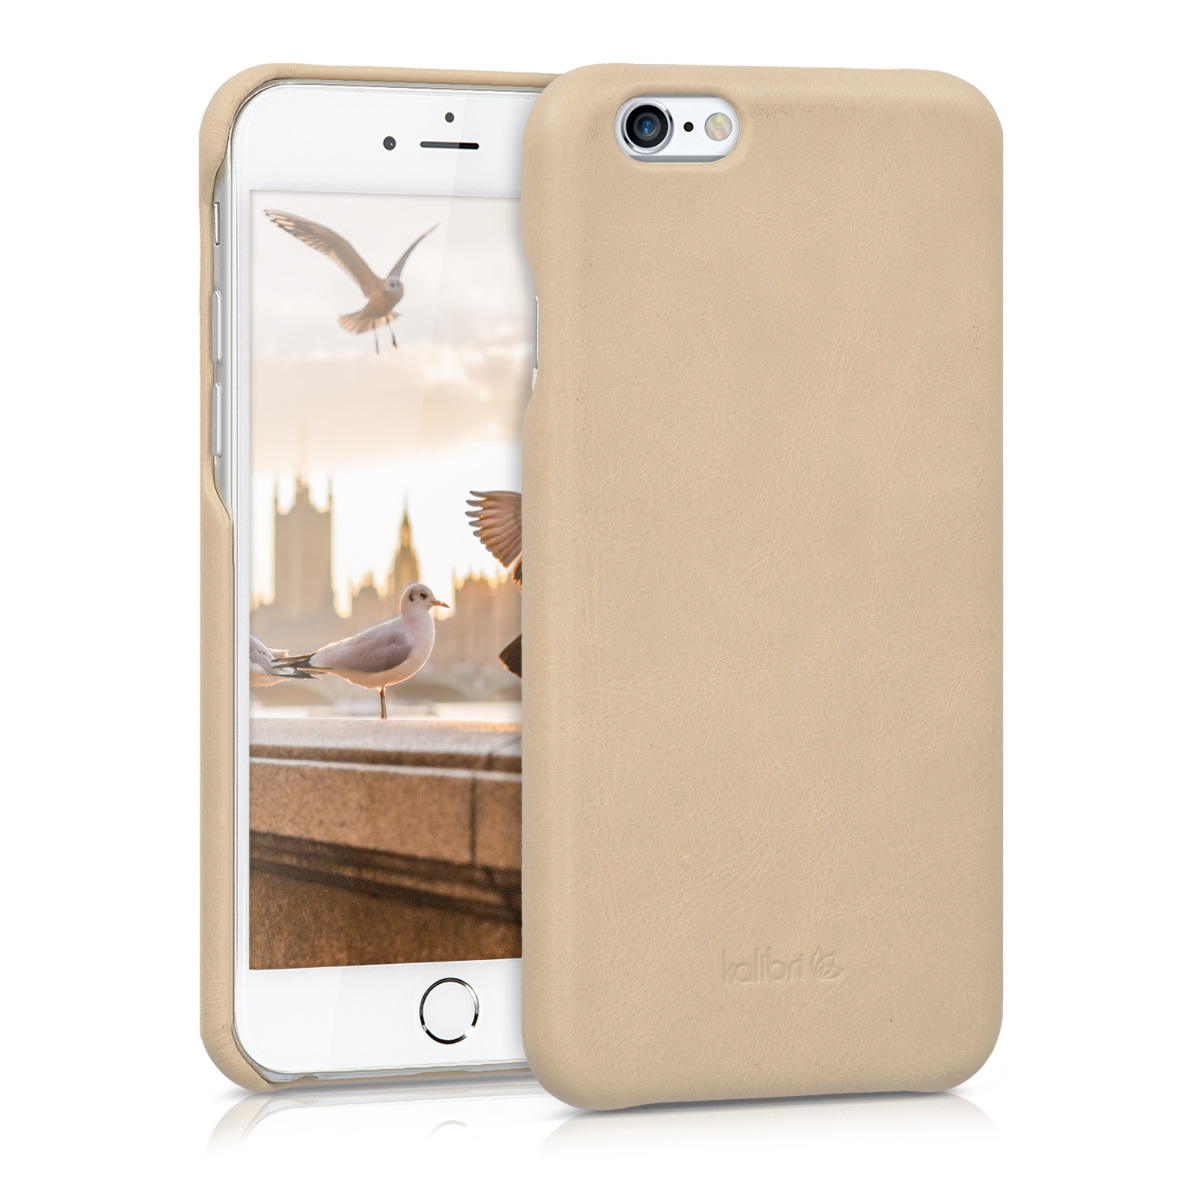 Kalibri Σκληρή Δερμάτινη iPhone 6 / 6S - Μπεζ(38961.11)